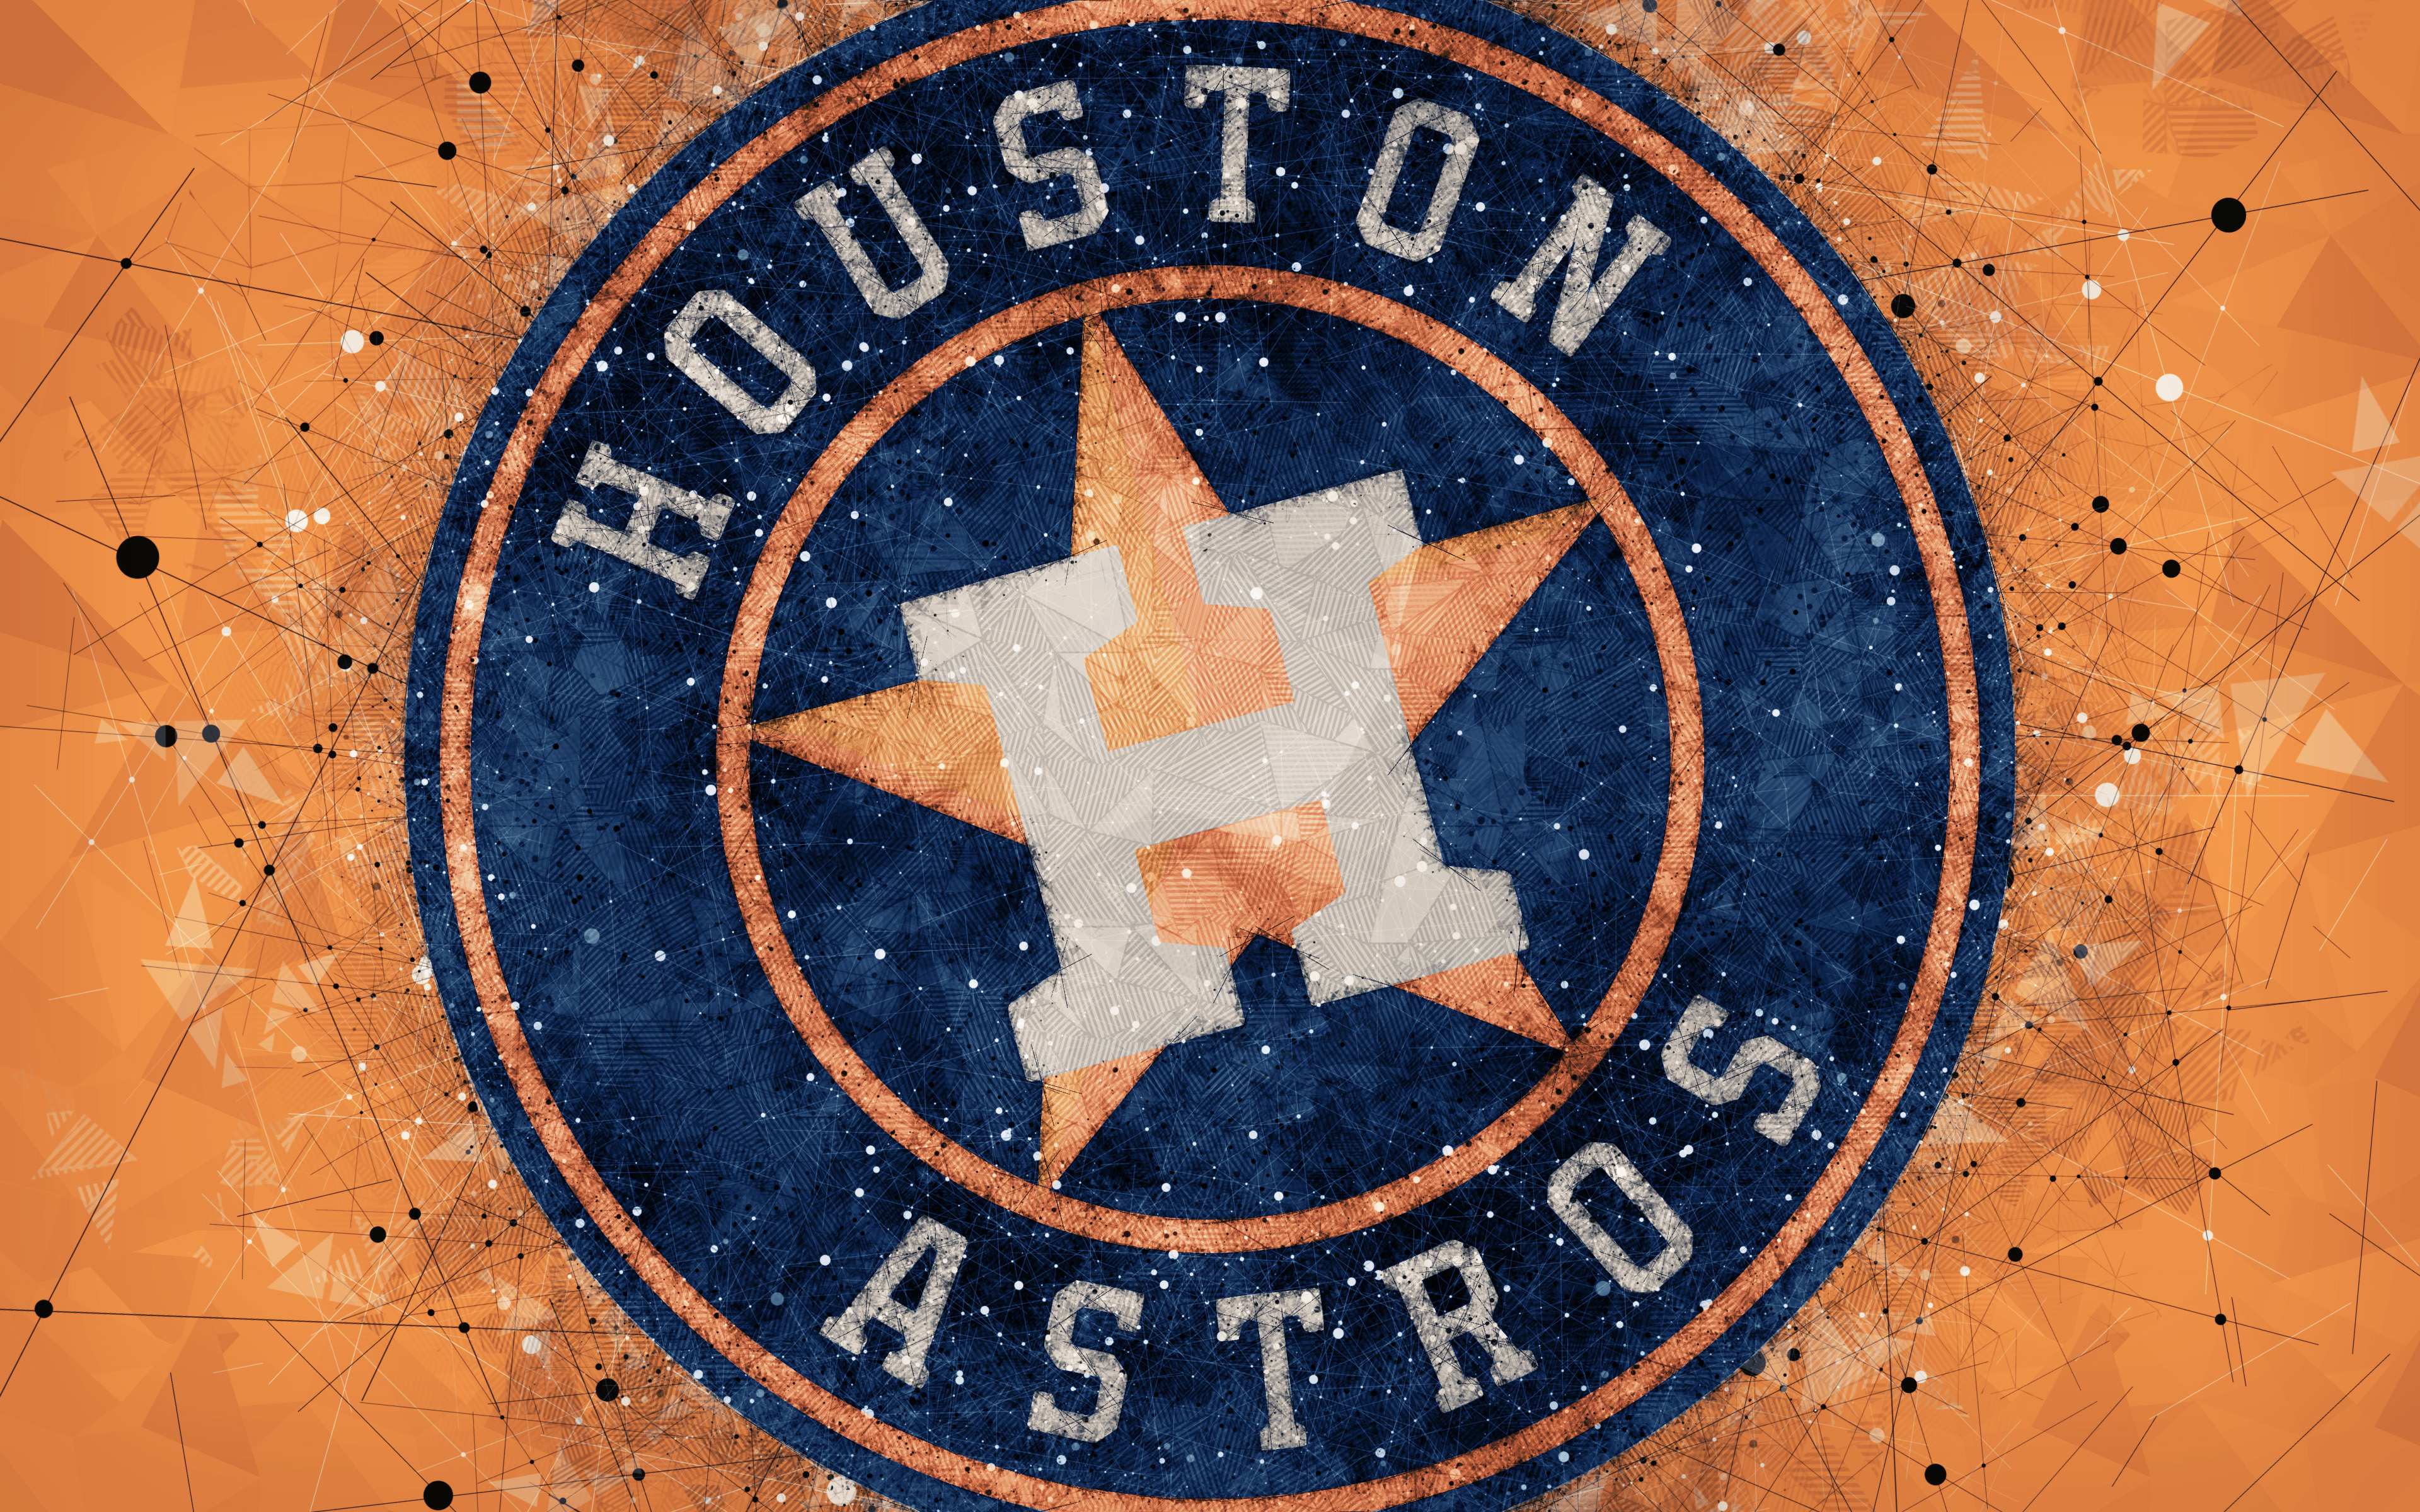 Houston Astros 4k Ultra Hd Wallpaper Background Image